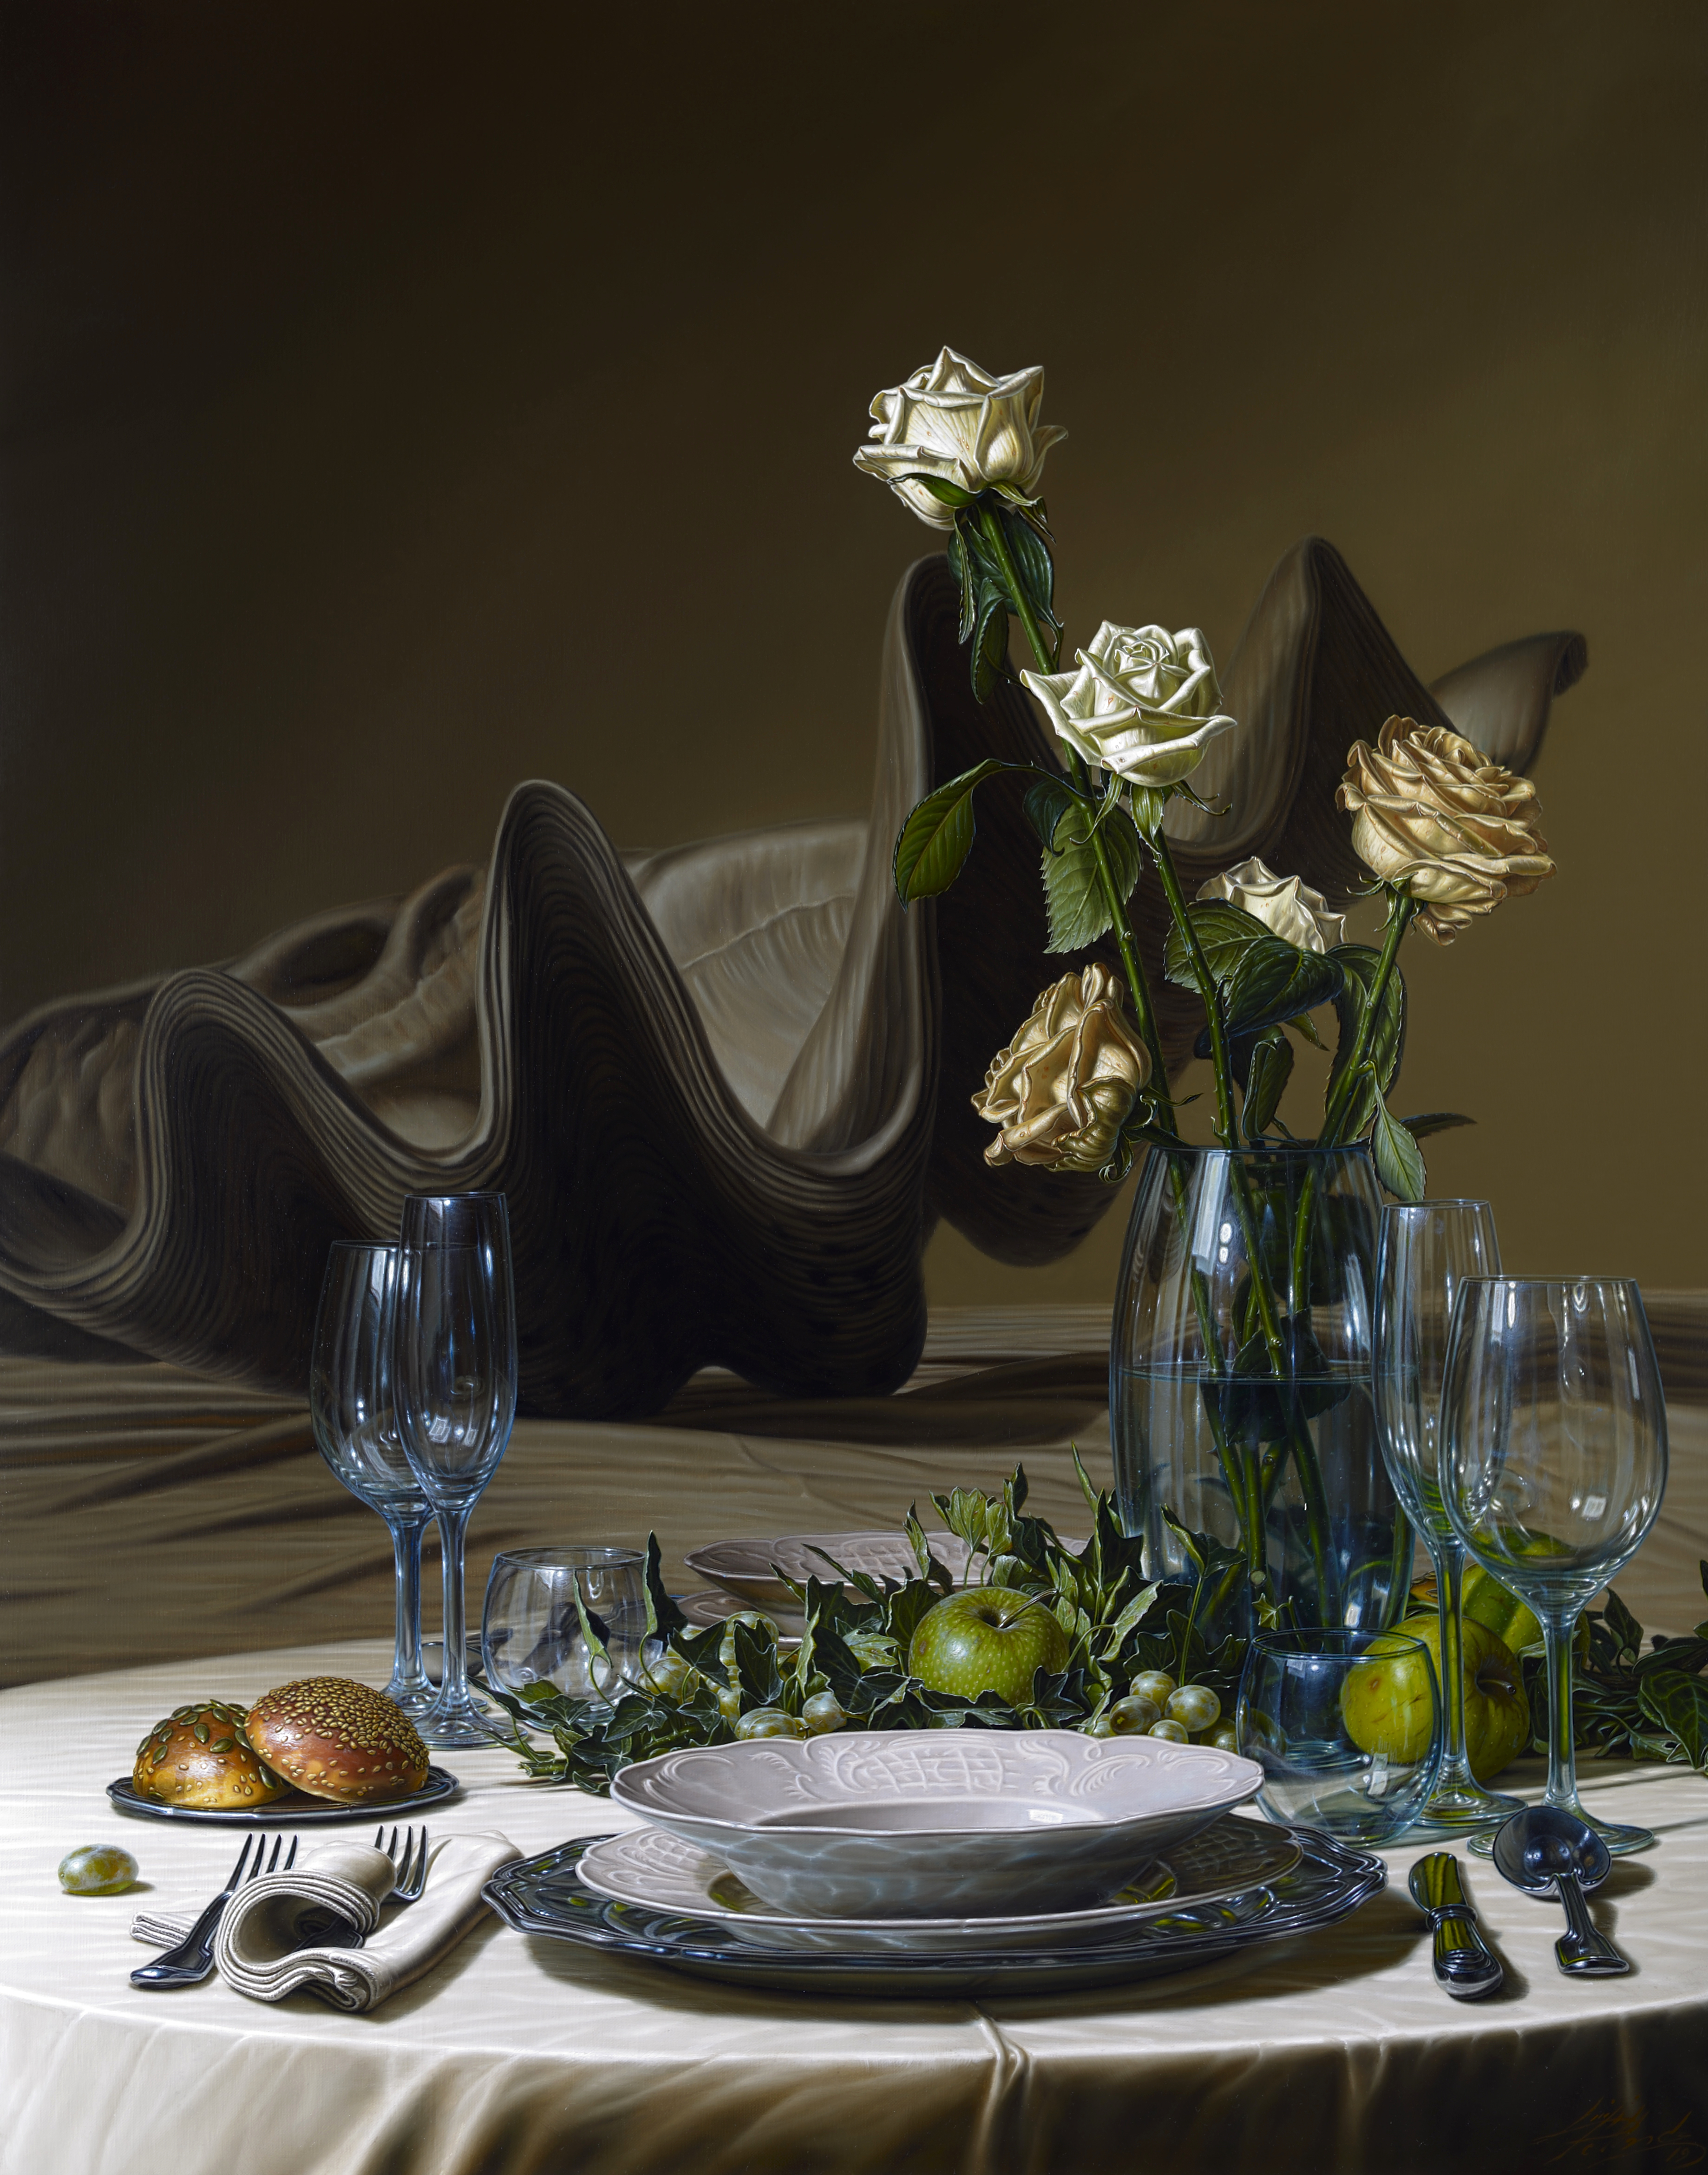 Pellanda 2019, La rosa mystica, olio su tela 74x94cm